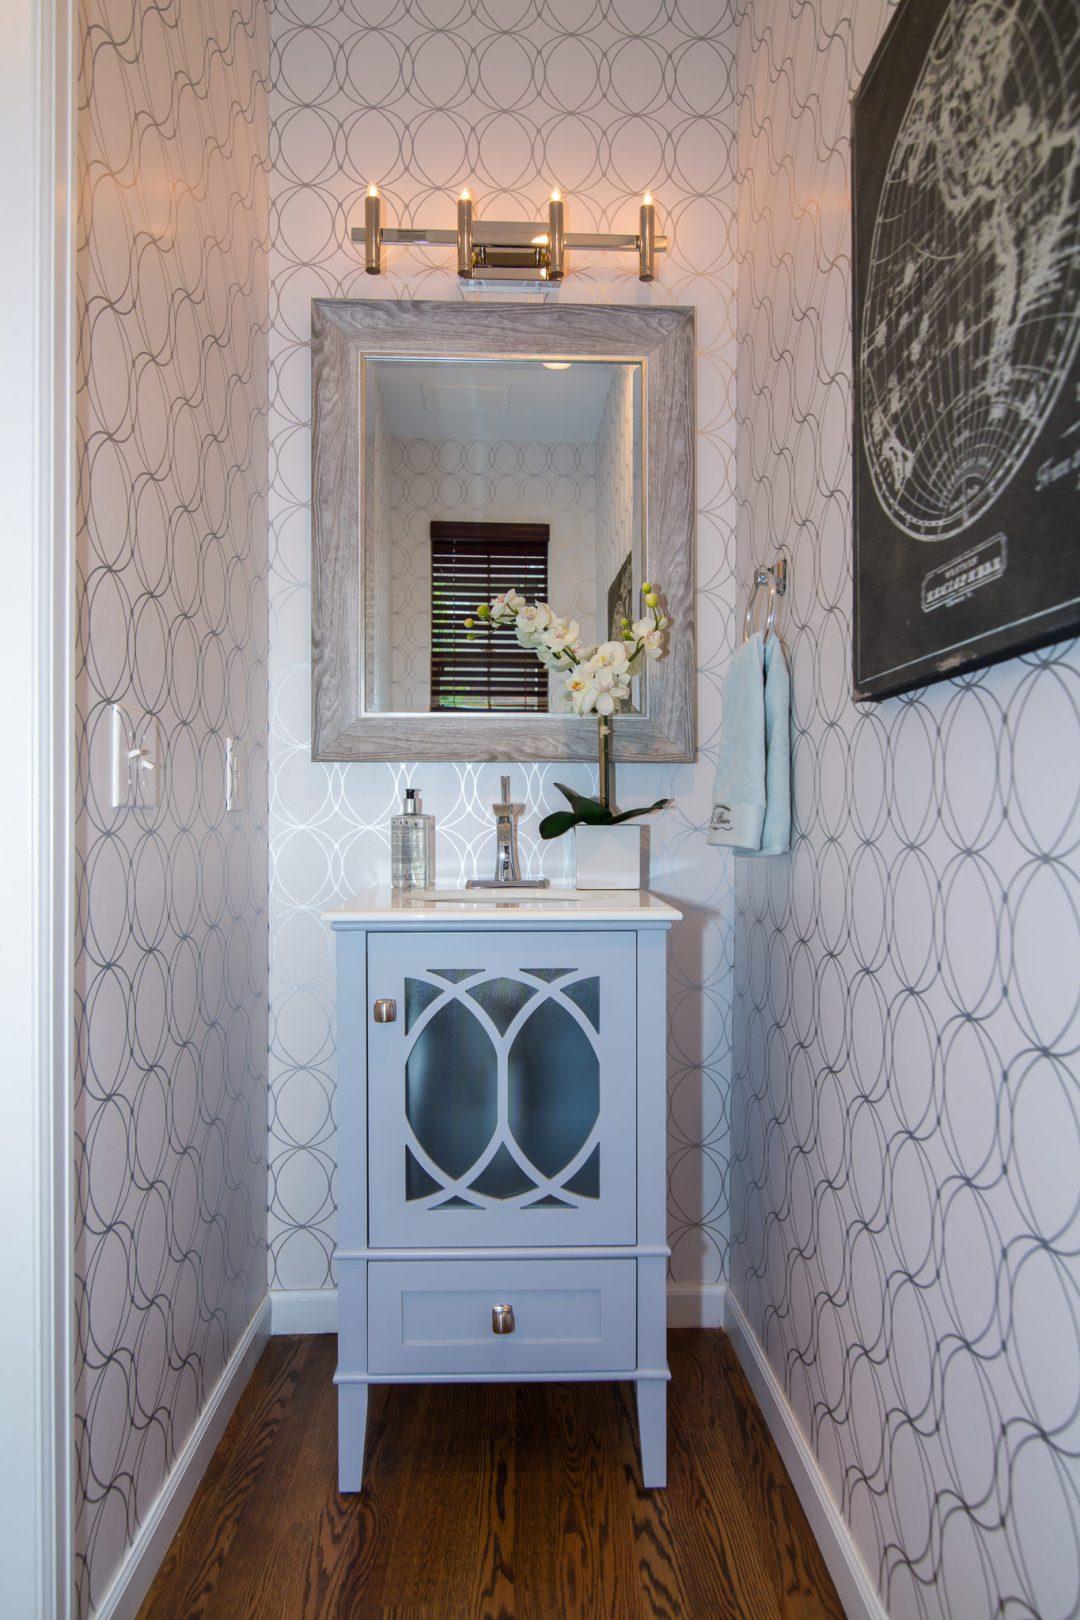 Julee, powder bathroom with circle wall paper